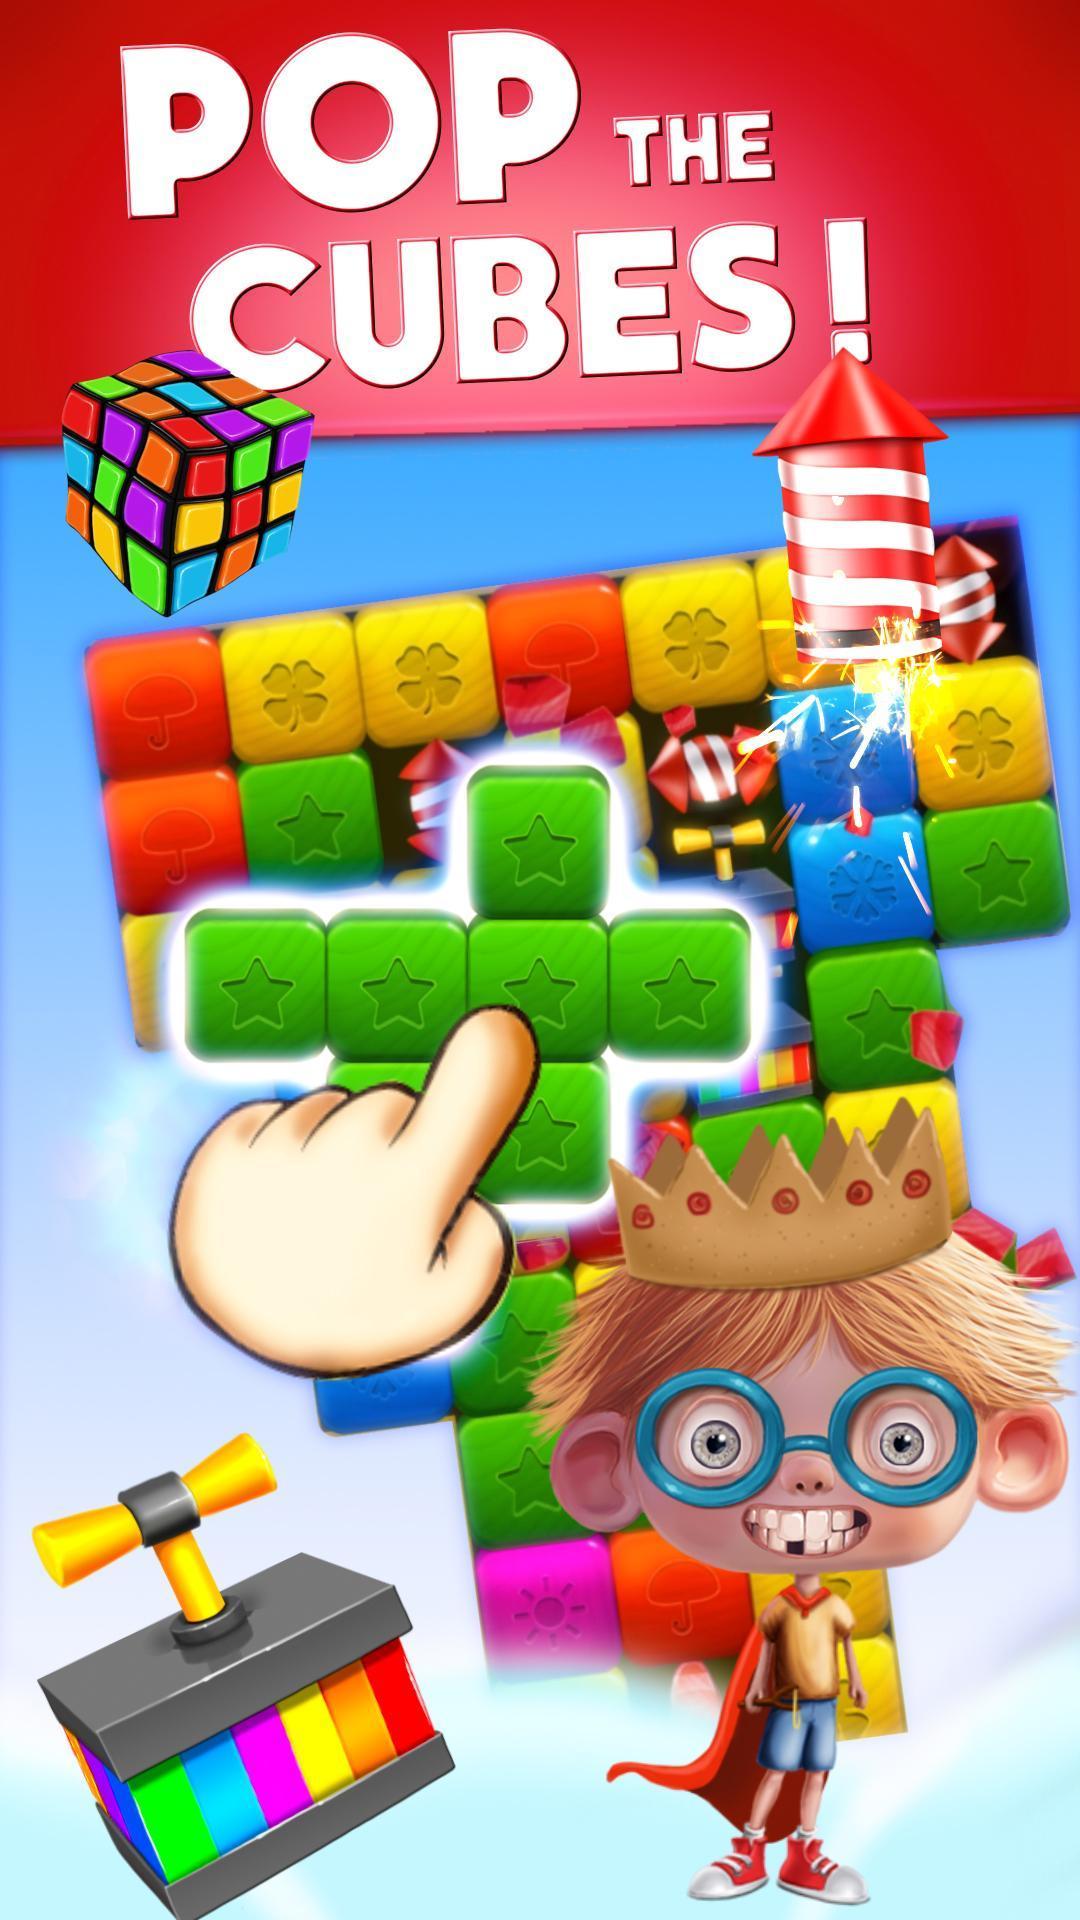 Toy Box Crazy Story - toys drop cubes 454 Screenshot 9